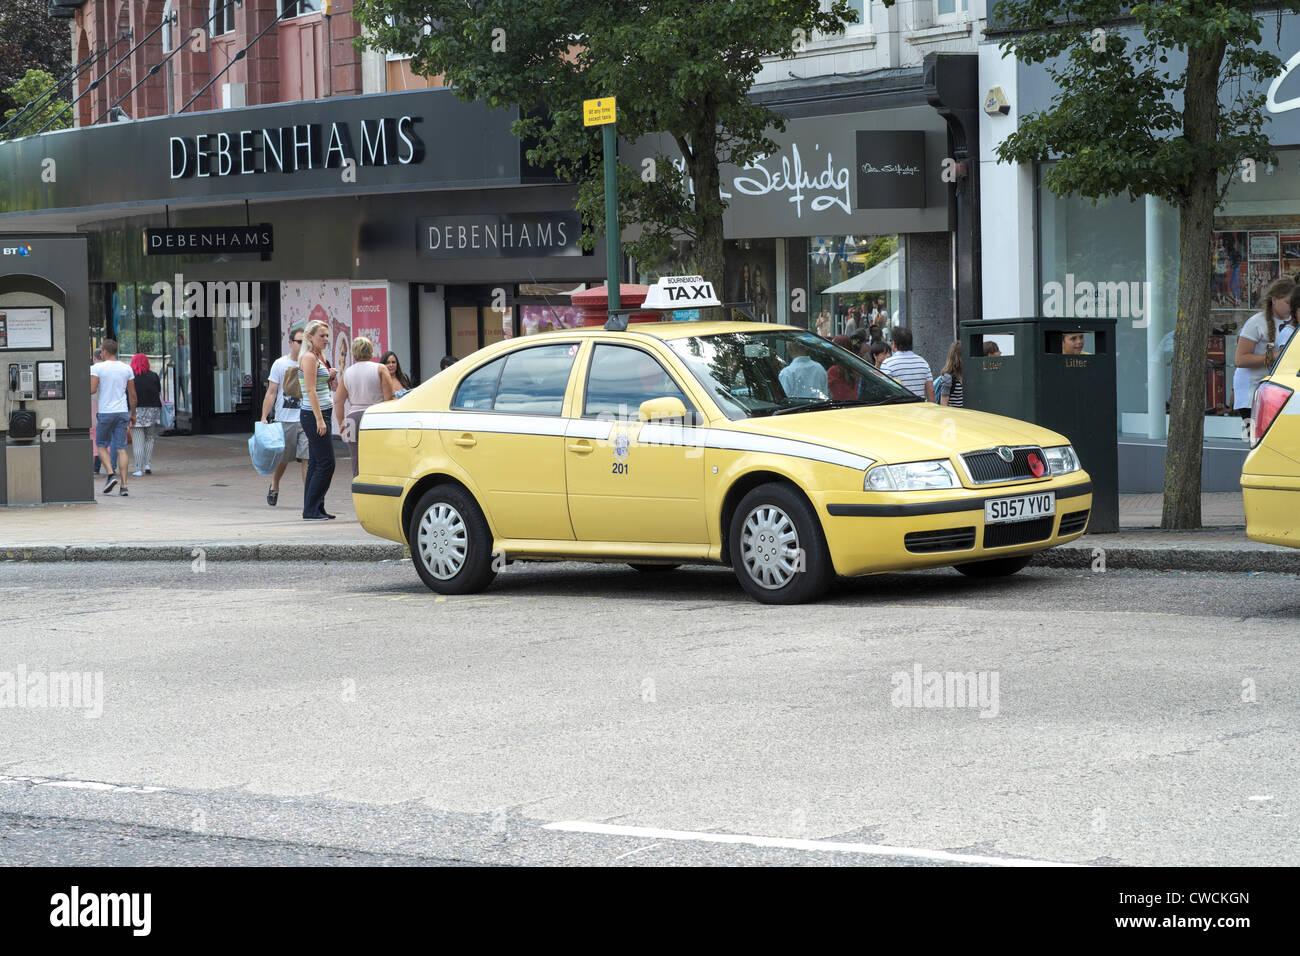 Yellow Skoda Taxi Cab In Bournemouth Stock Photo 50065925 Alamy